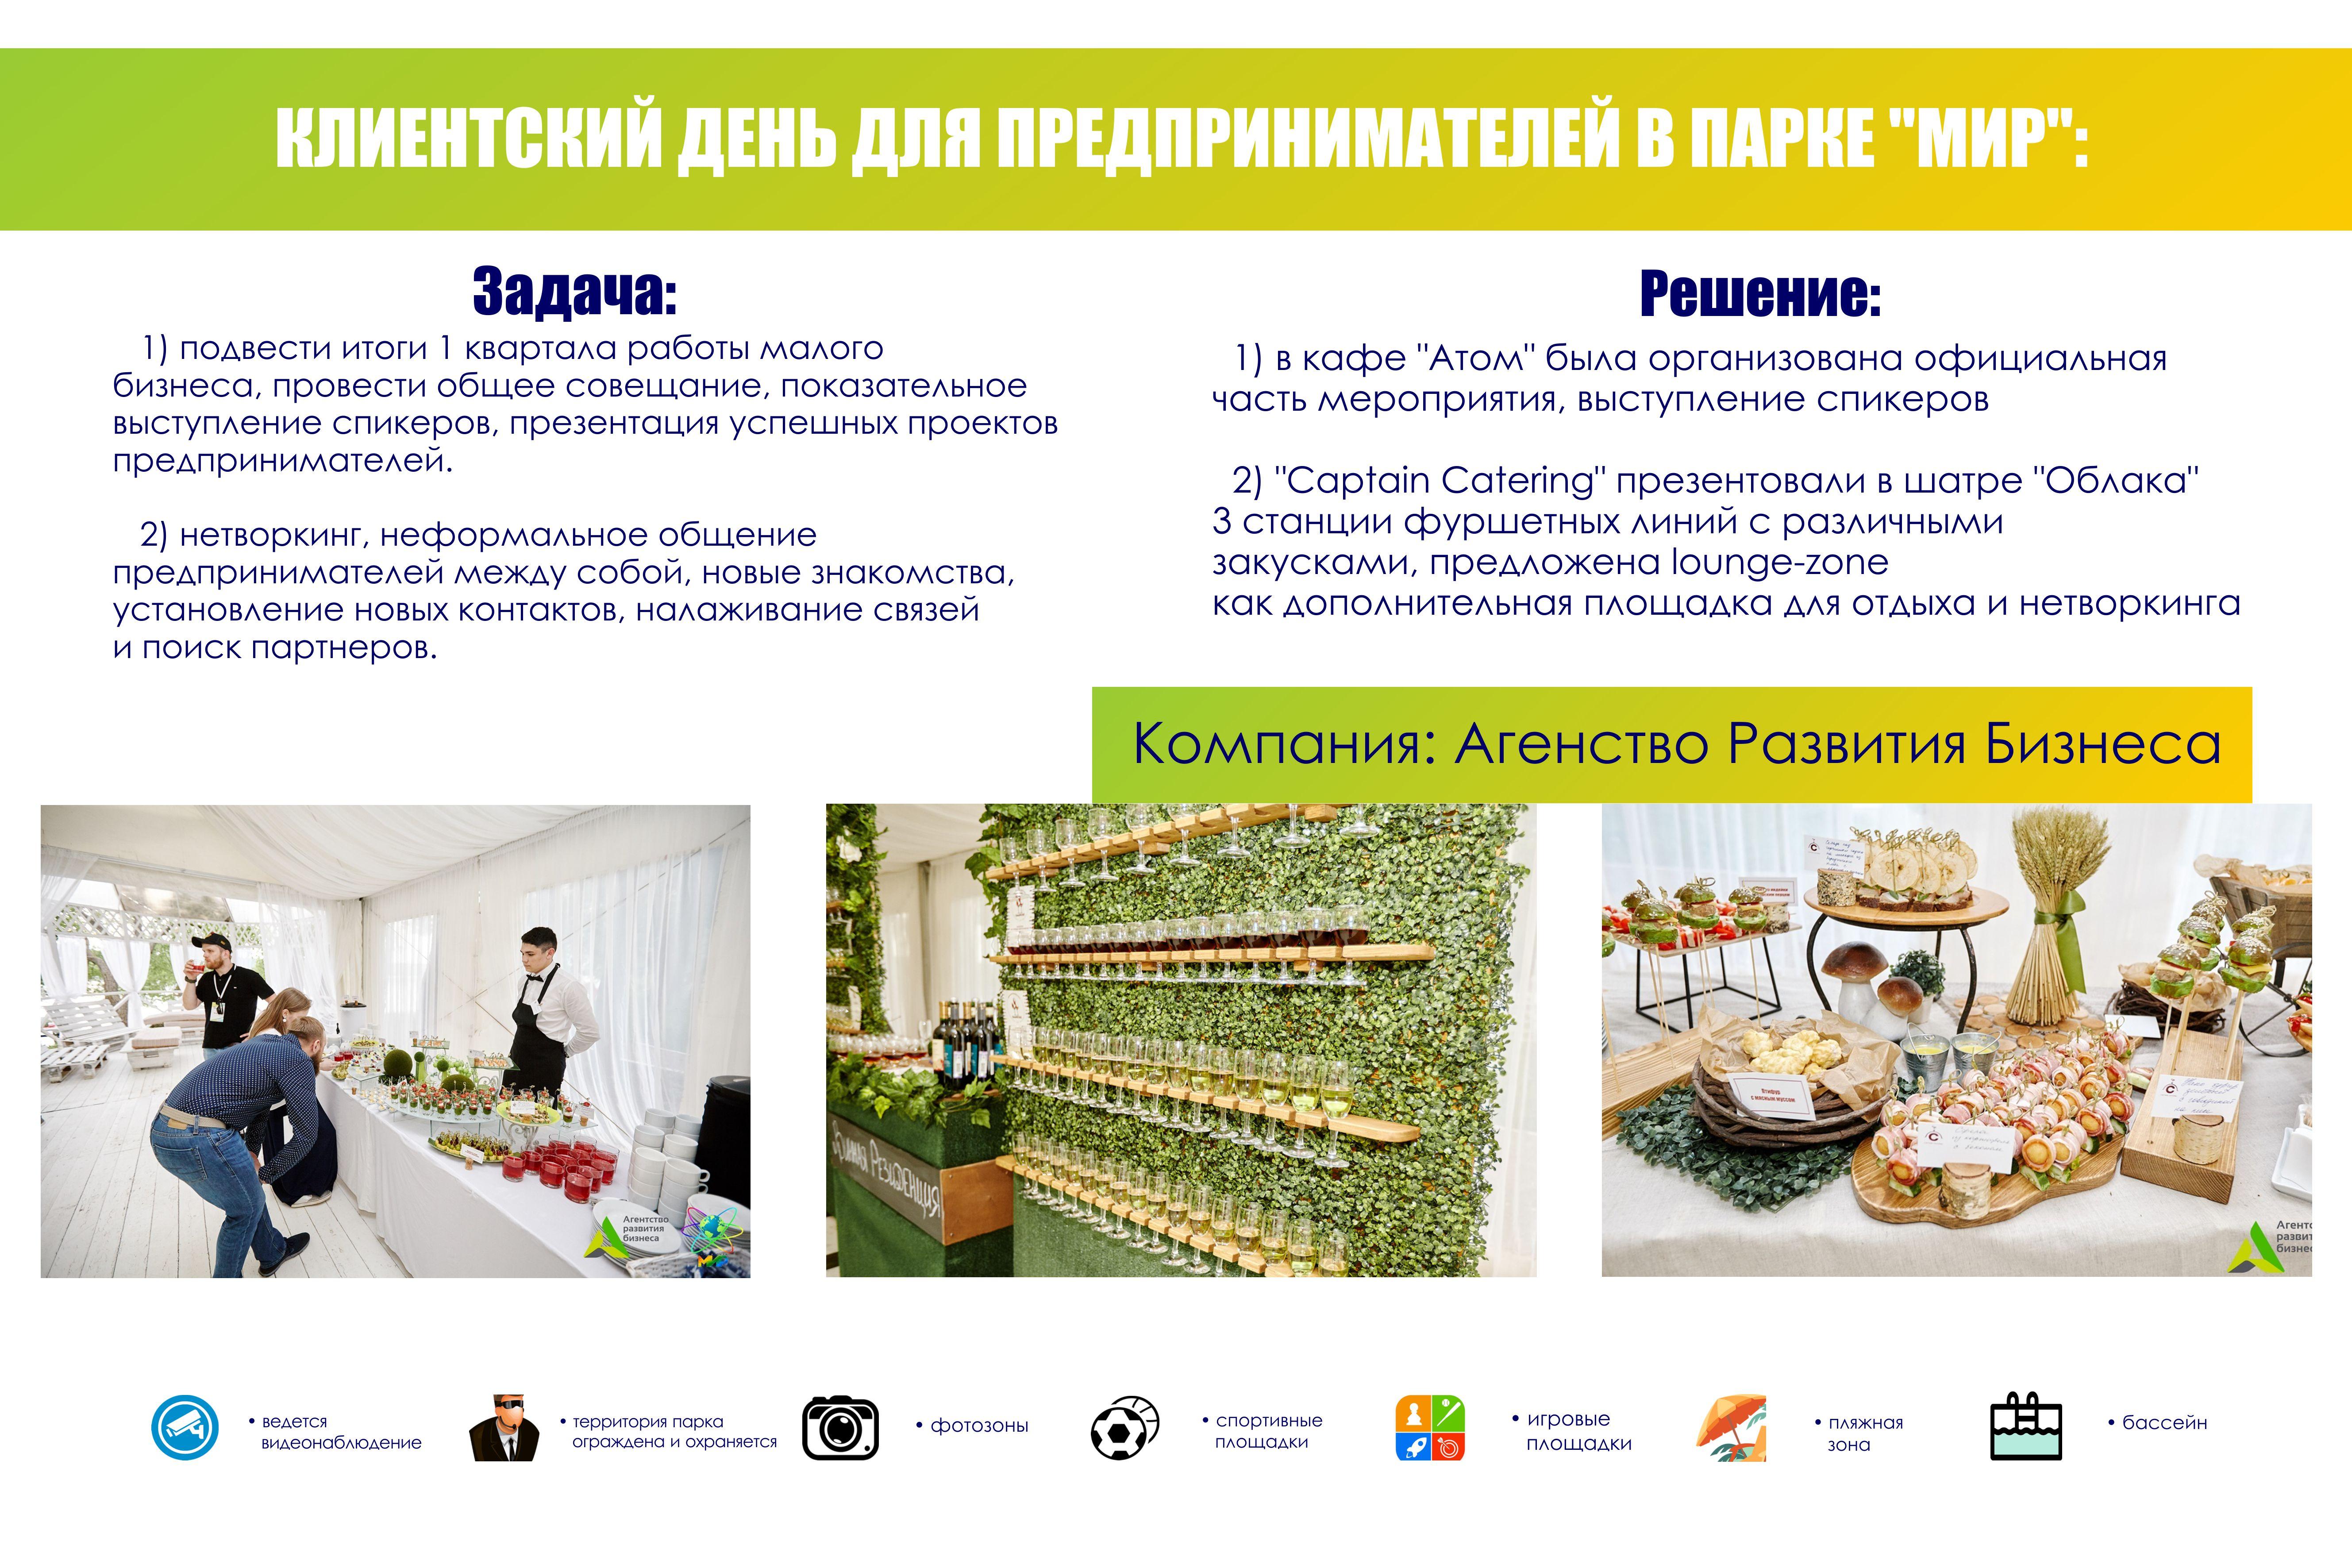 Компания АГЕНТСТВО РАЗВИТИЯ БИЗНЕСА